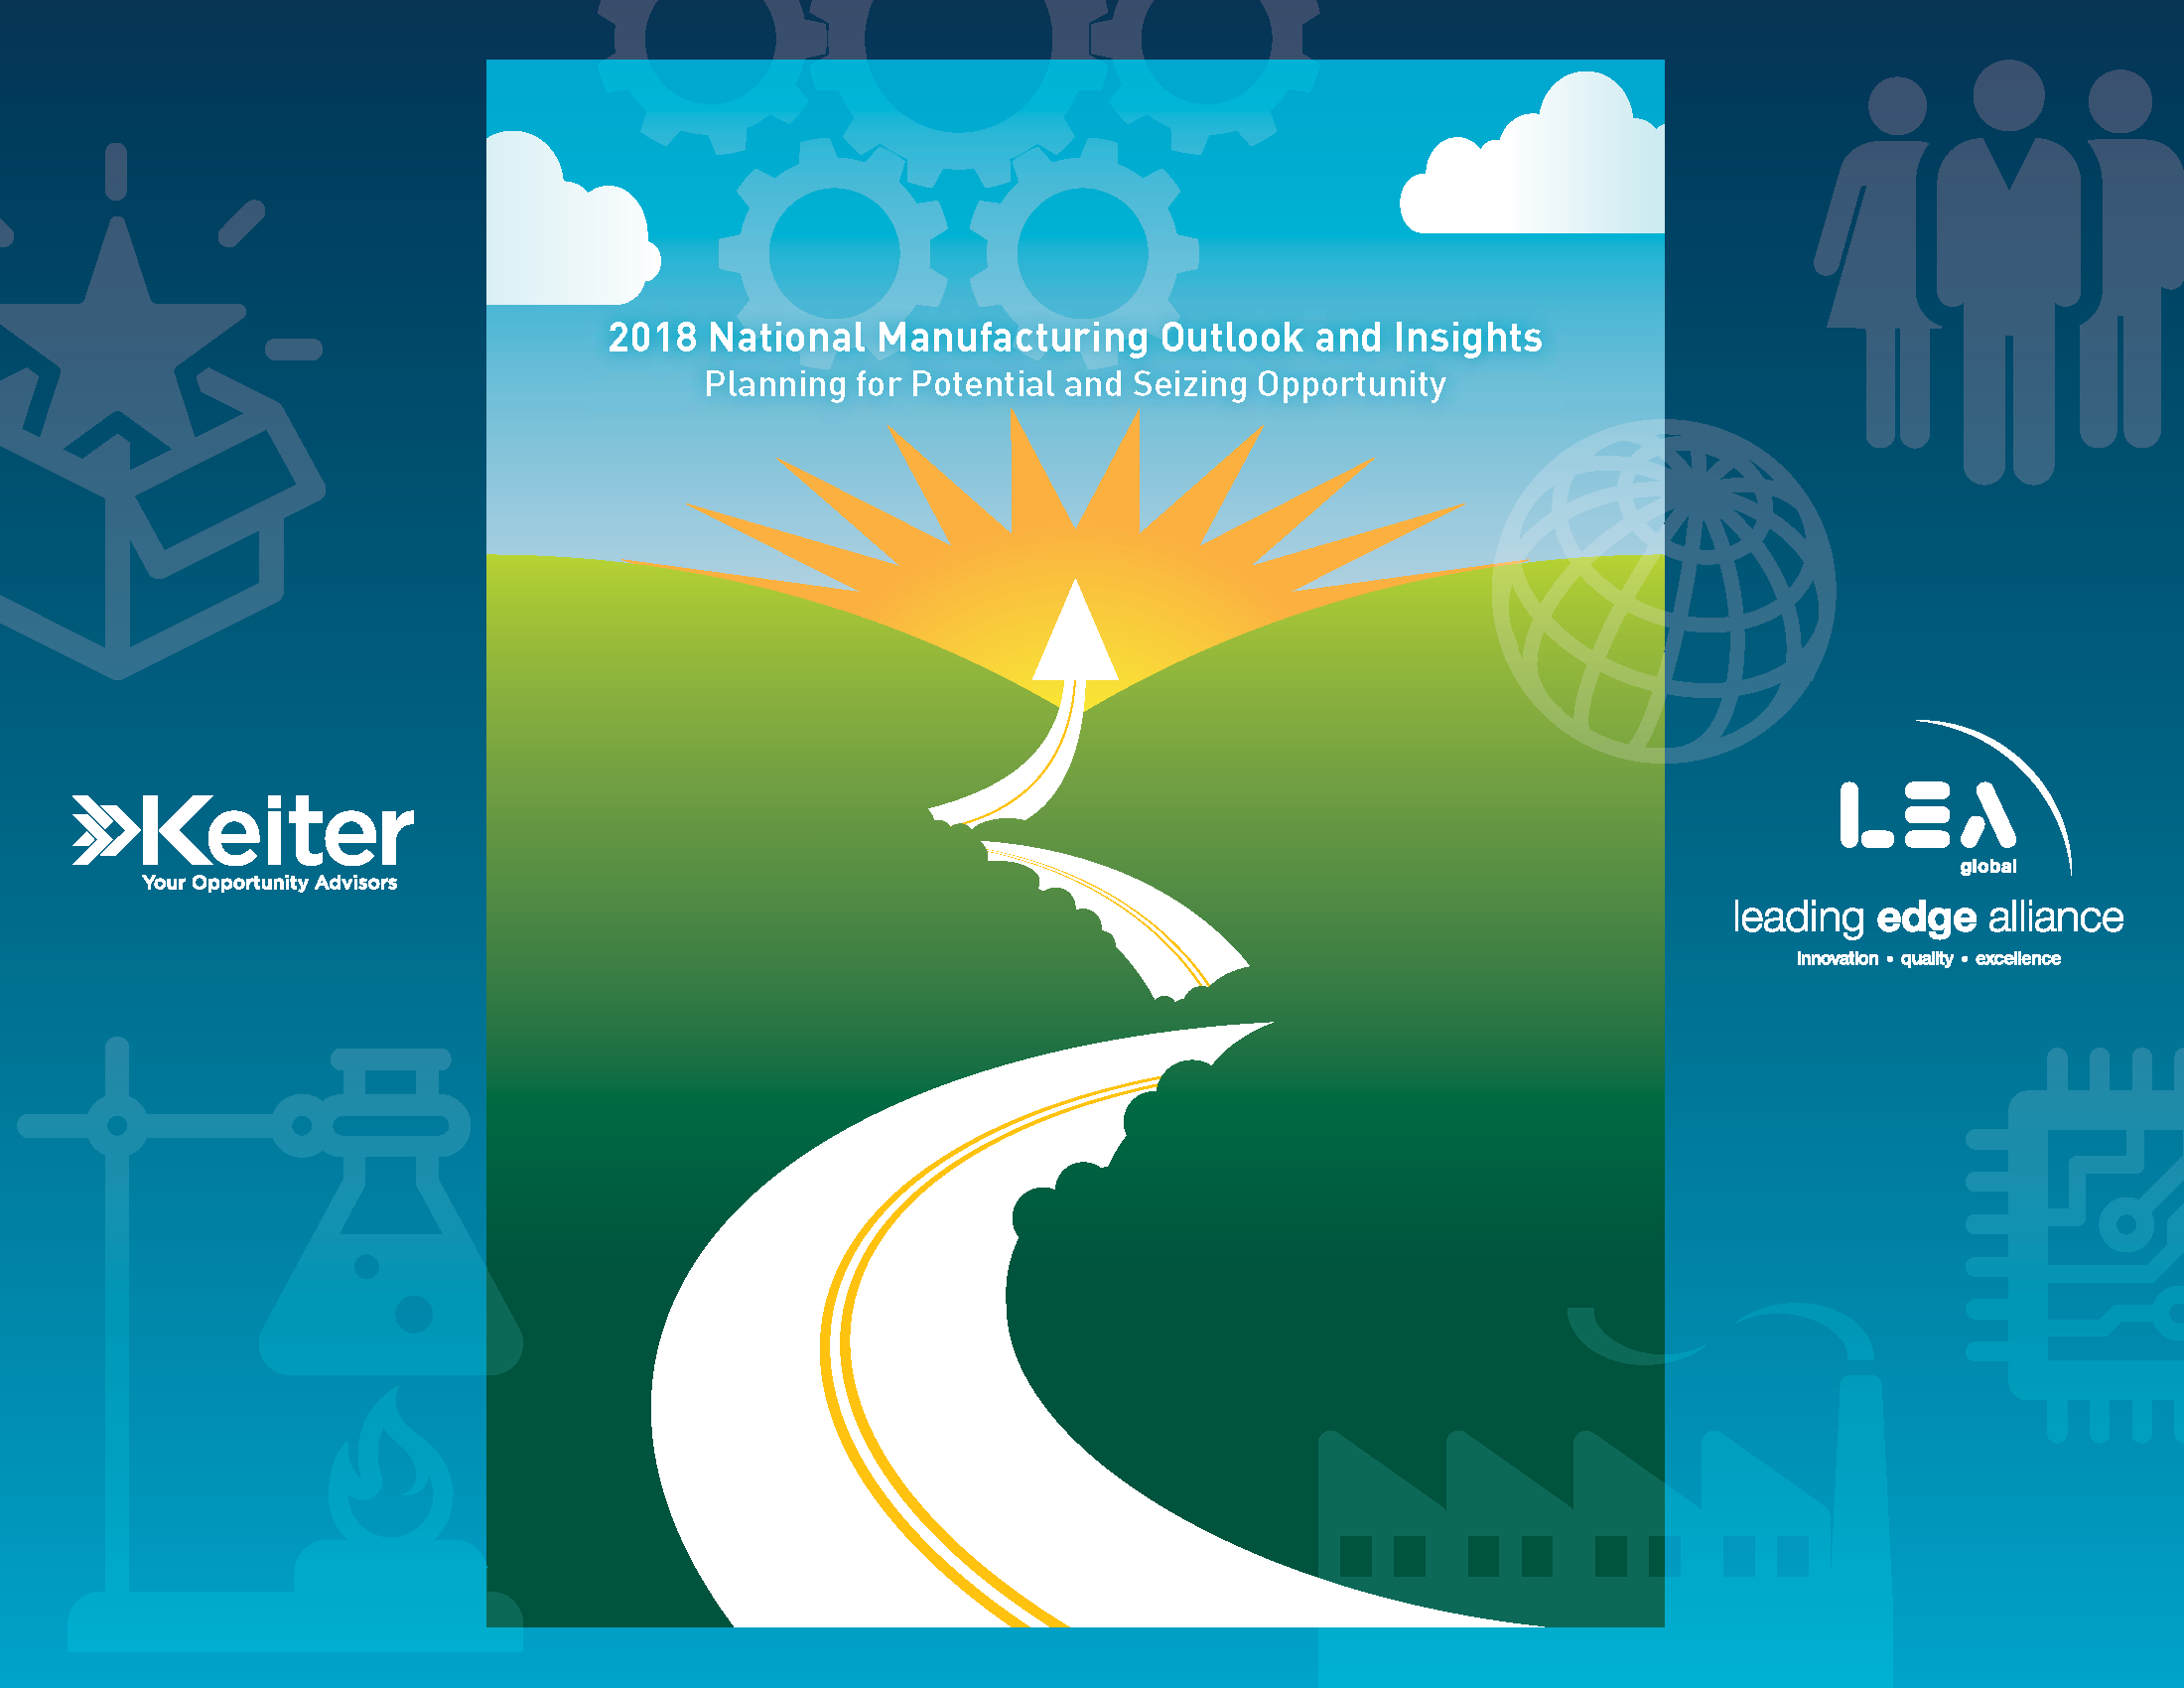 2018 LEA Manufacturing Survey Outlook thumbnail.png